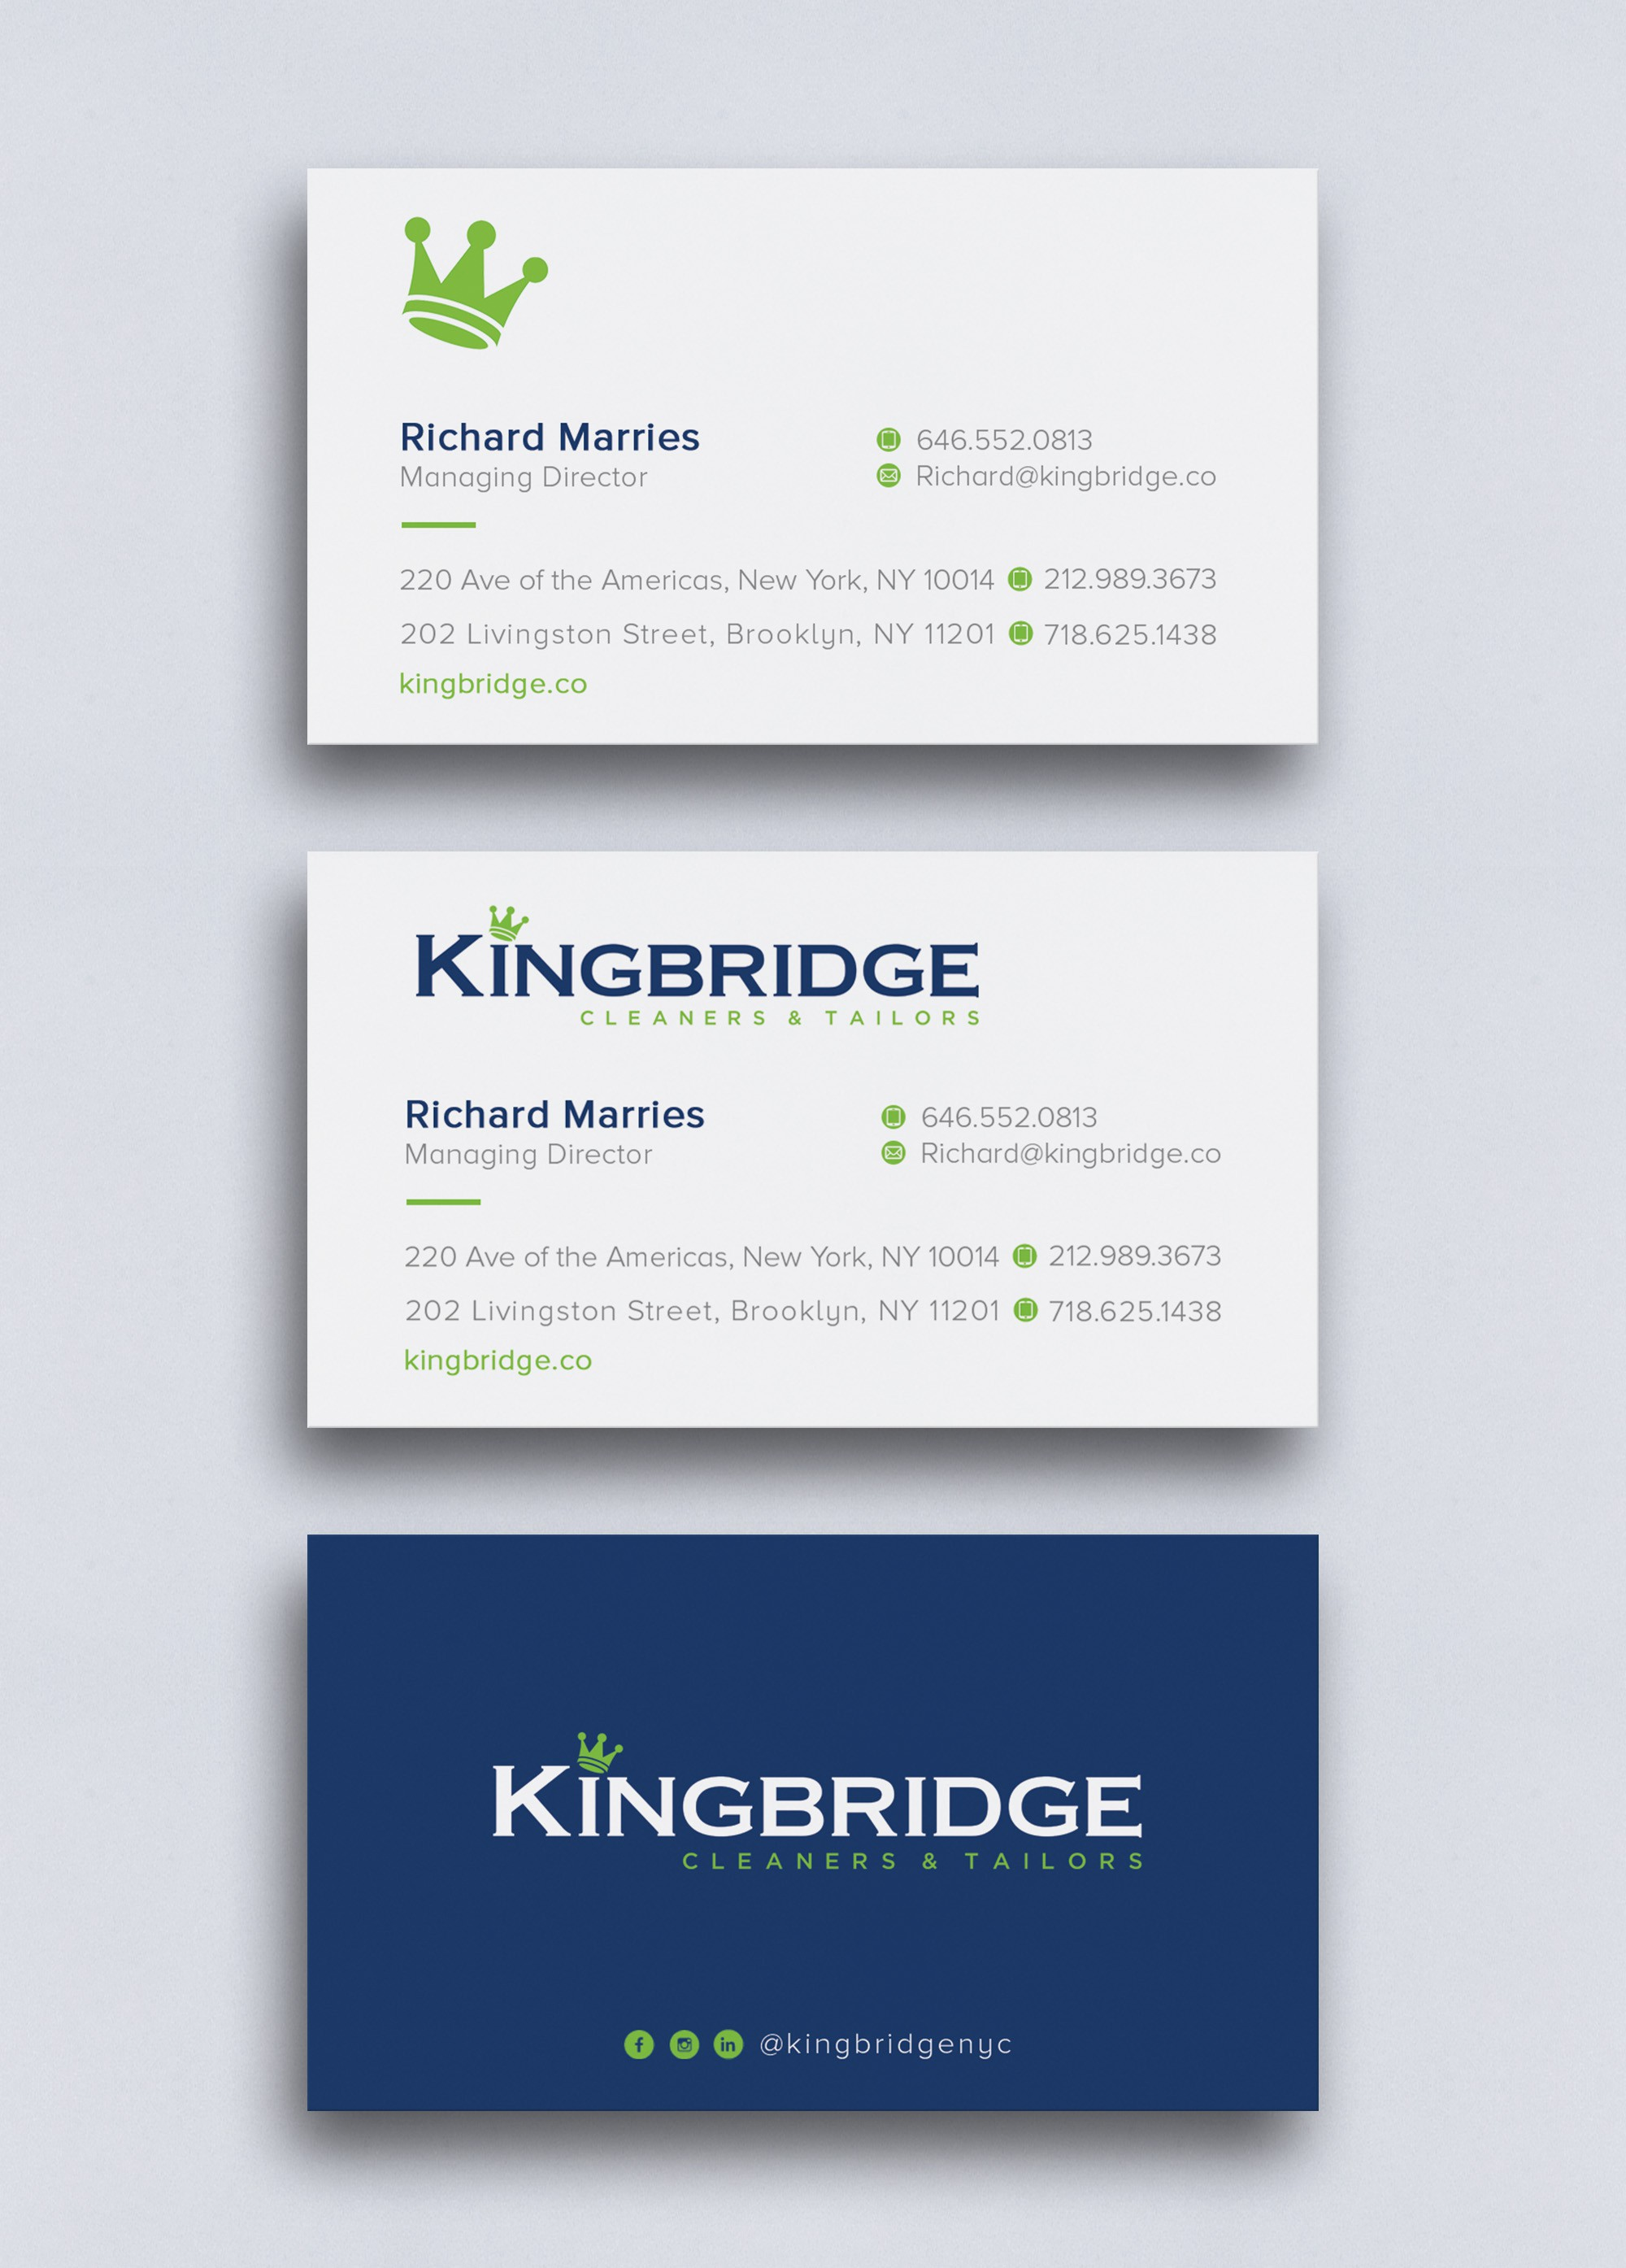 Kingbridge need Business Cards!